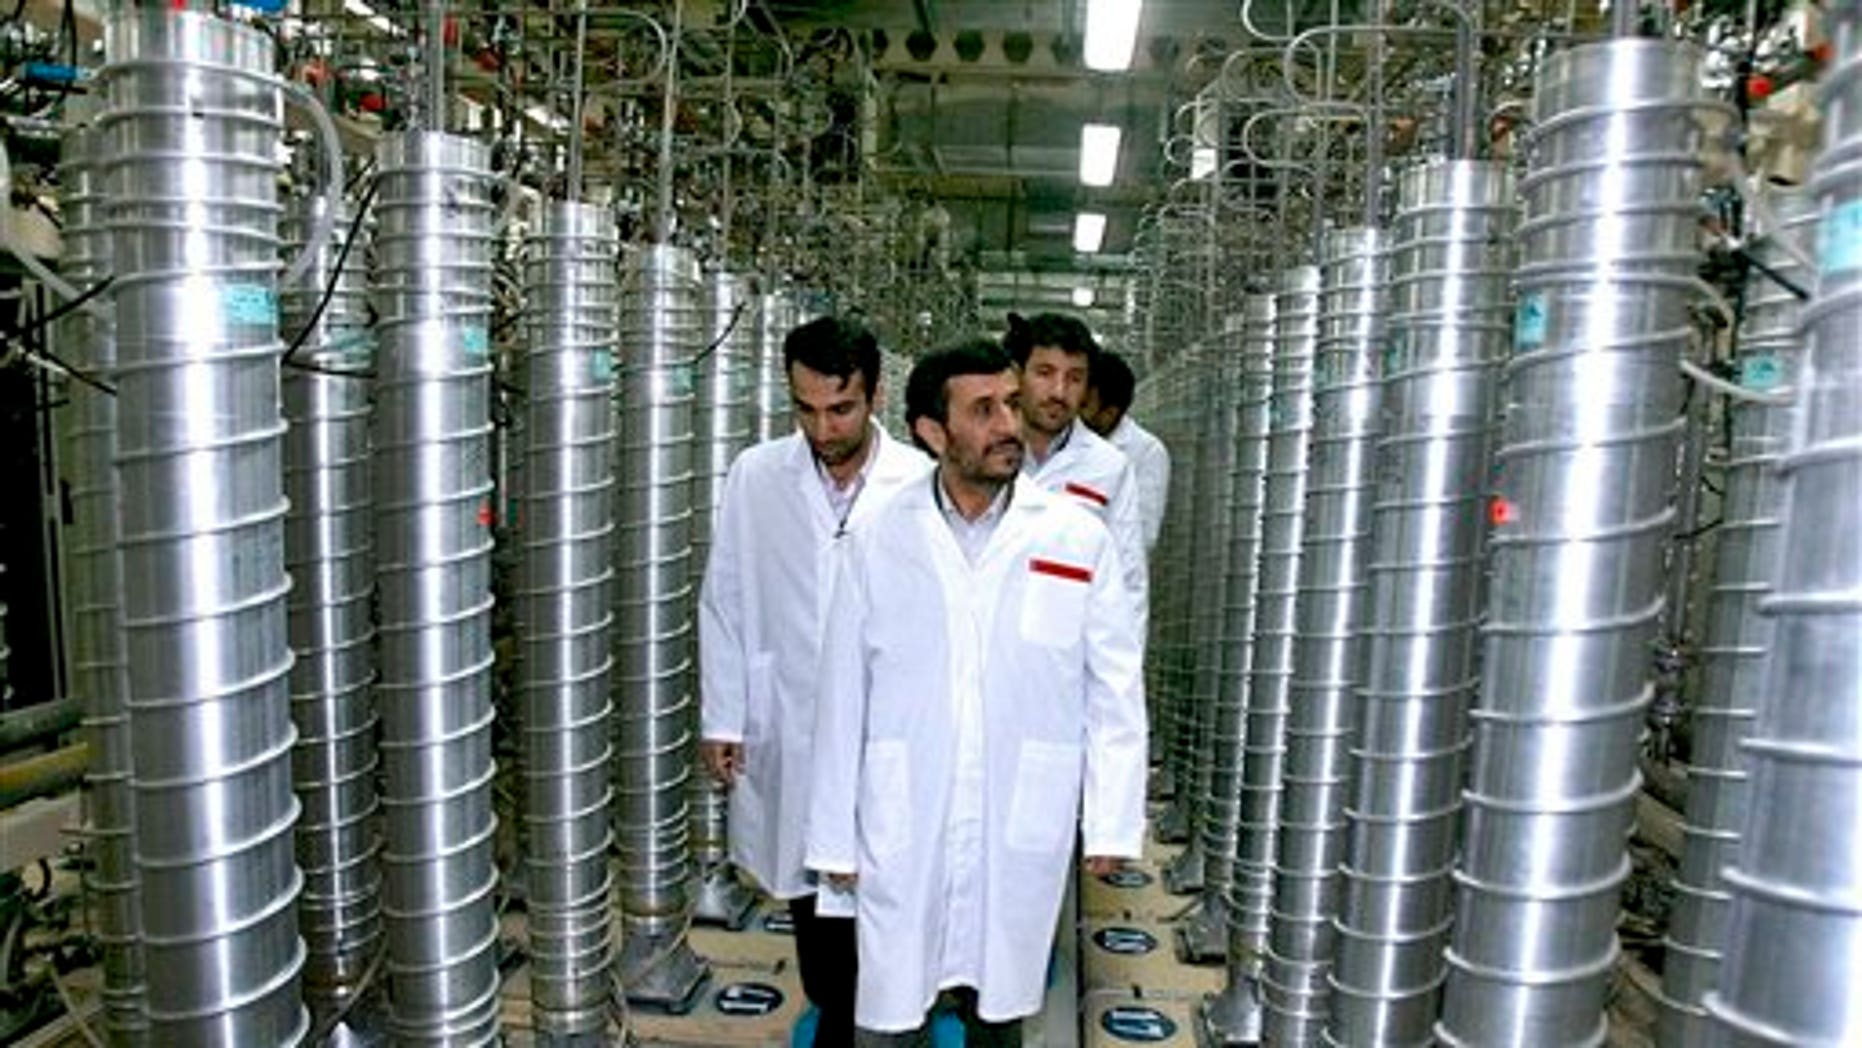 2008: Iranian President Mahmoud Ahmadinejad visits the Natanz Uranium Enrichment Facility in Iran.